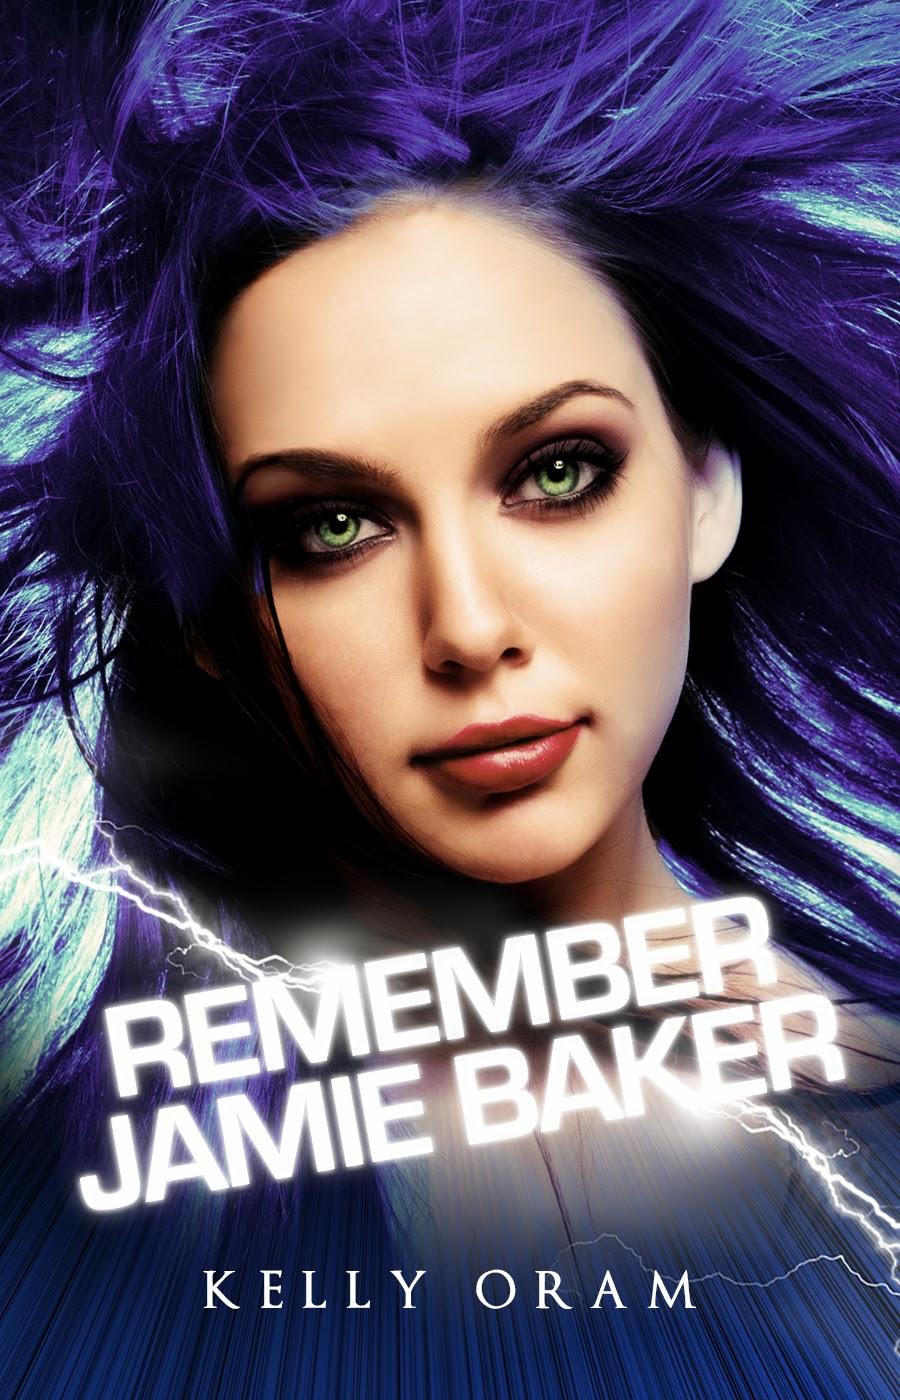 Jamie Baker Net Worth